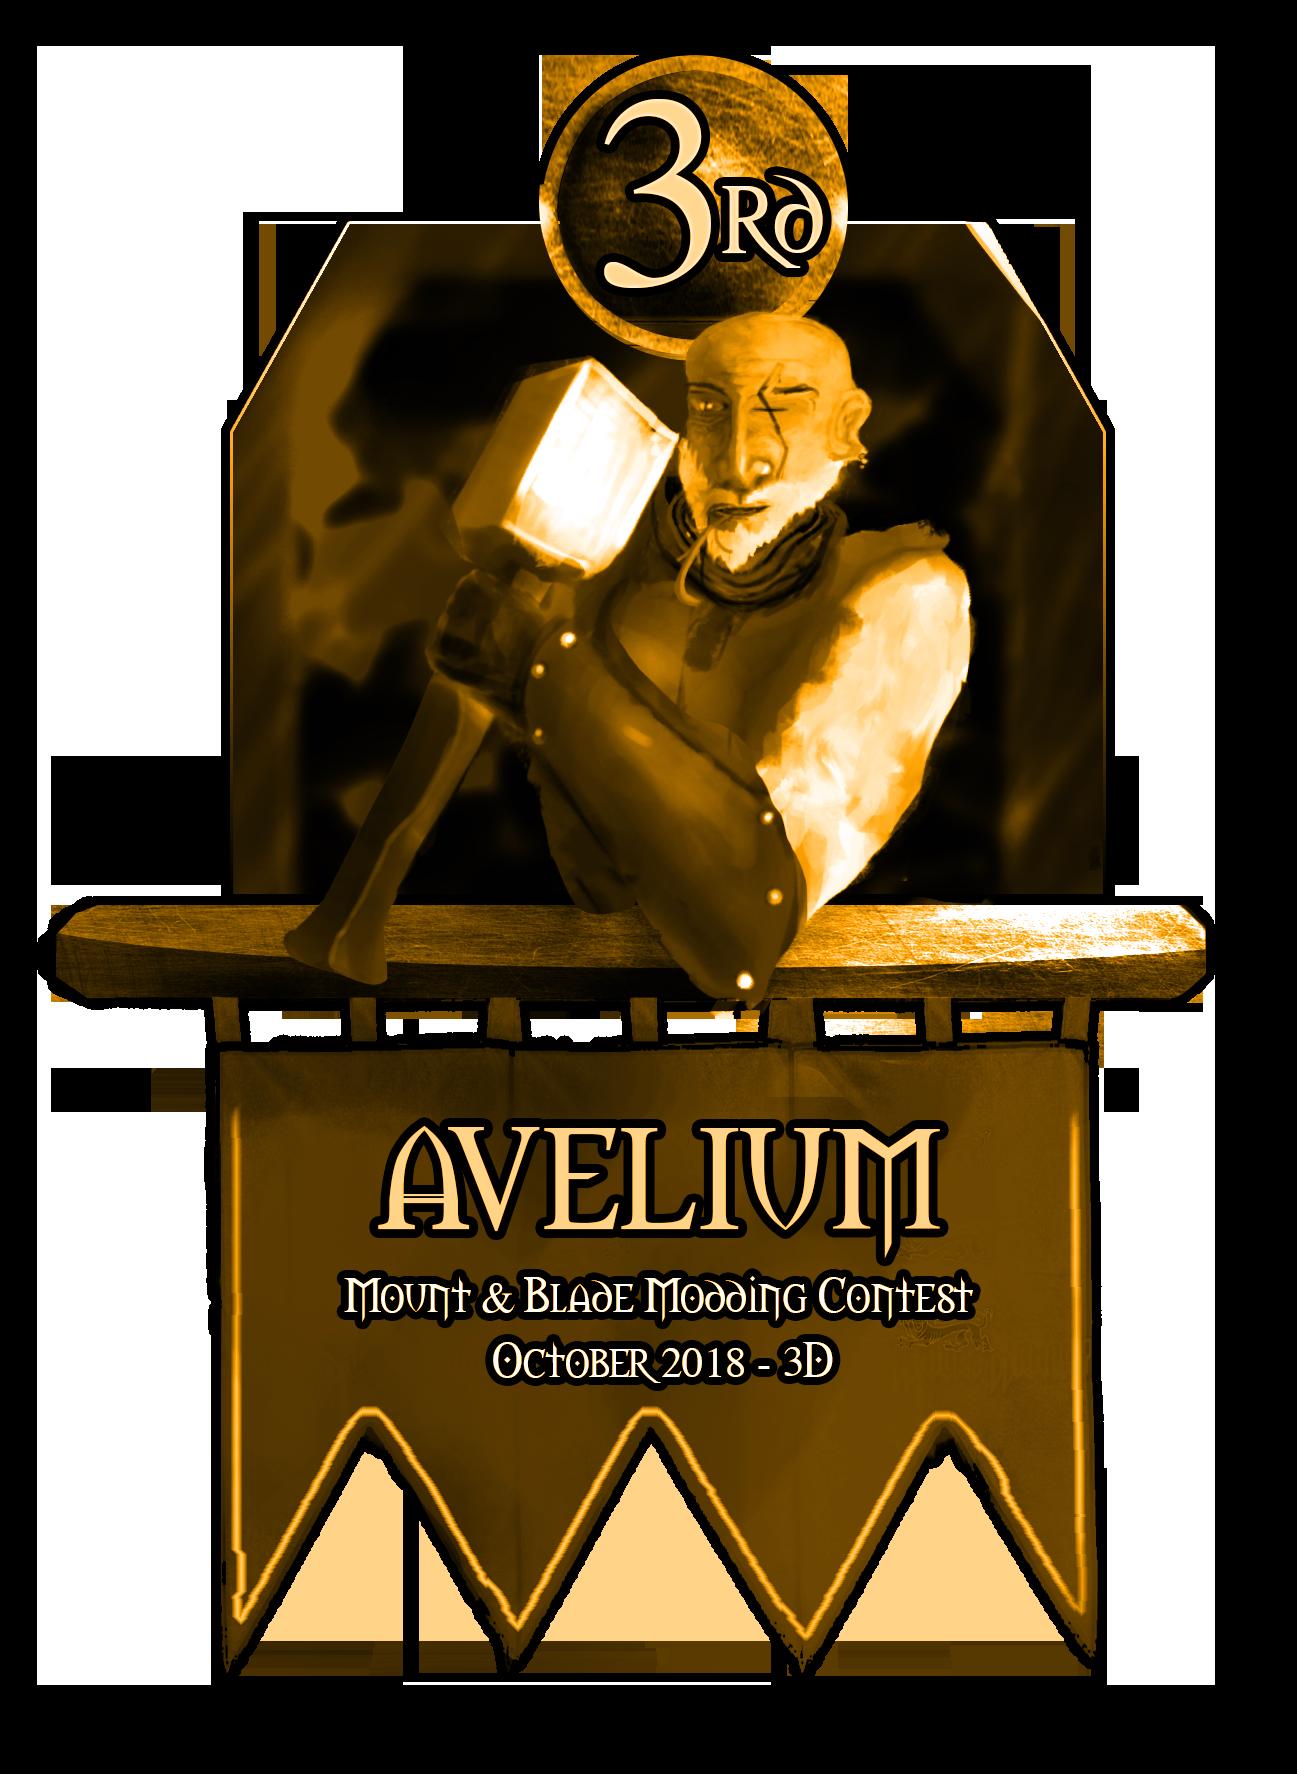 Avelium3.png